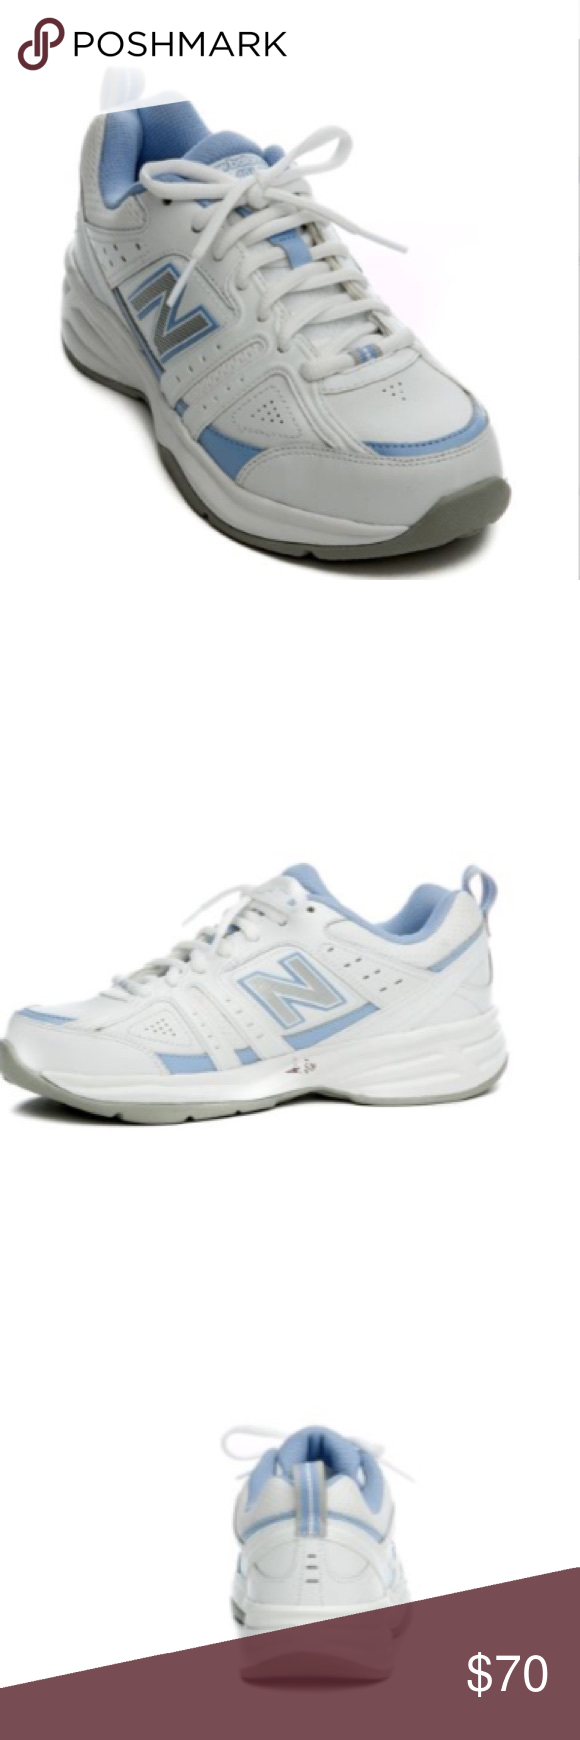 agudo participar texto  🍀 New Balance Women's 401 Leather Athletic Shoe | Athletic shoes, New  balance women, New balance shoes